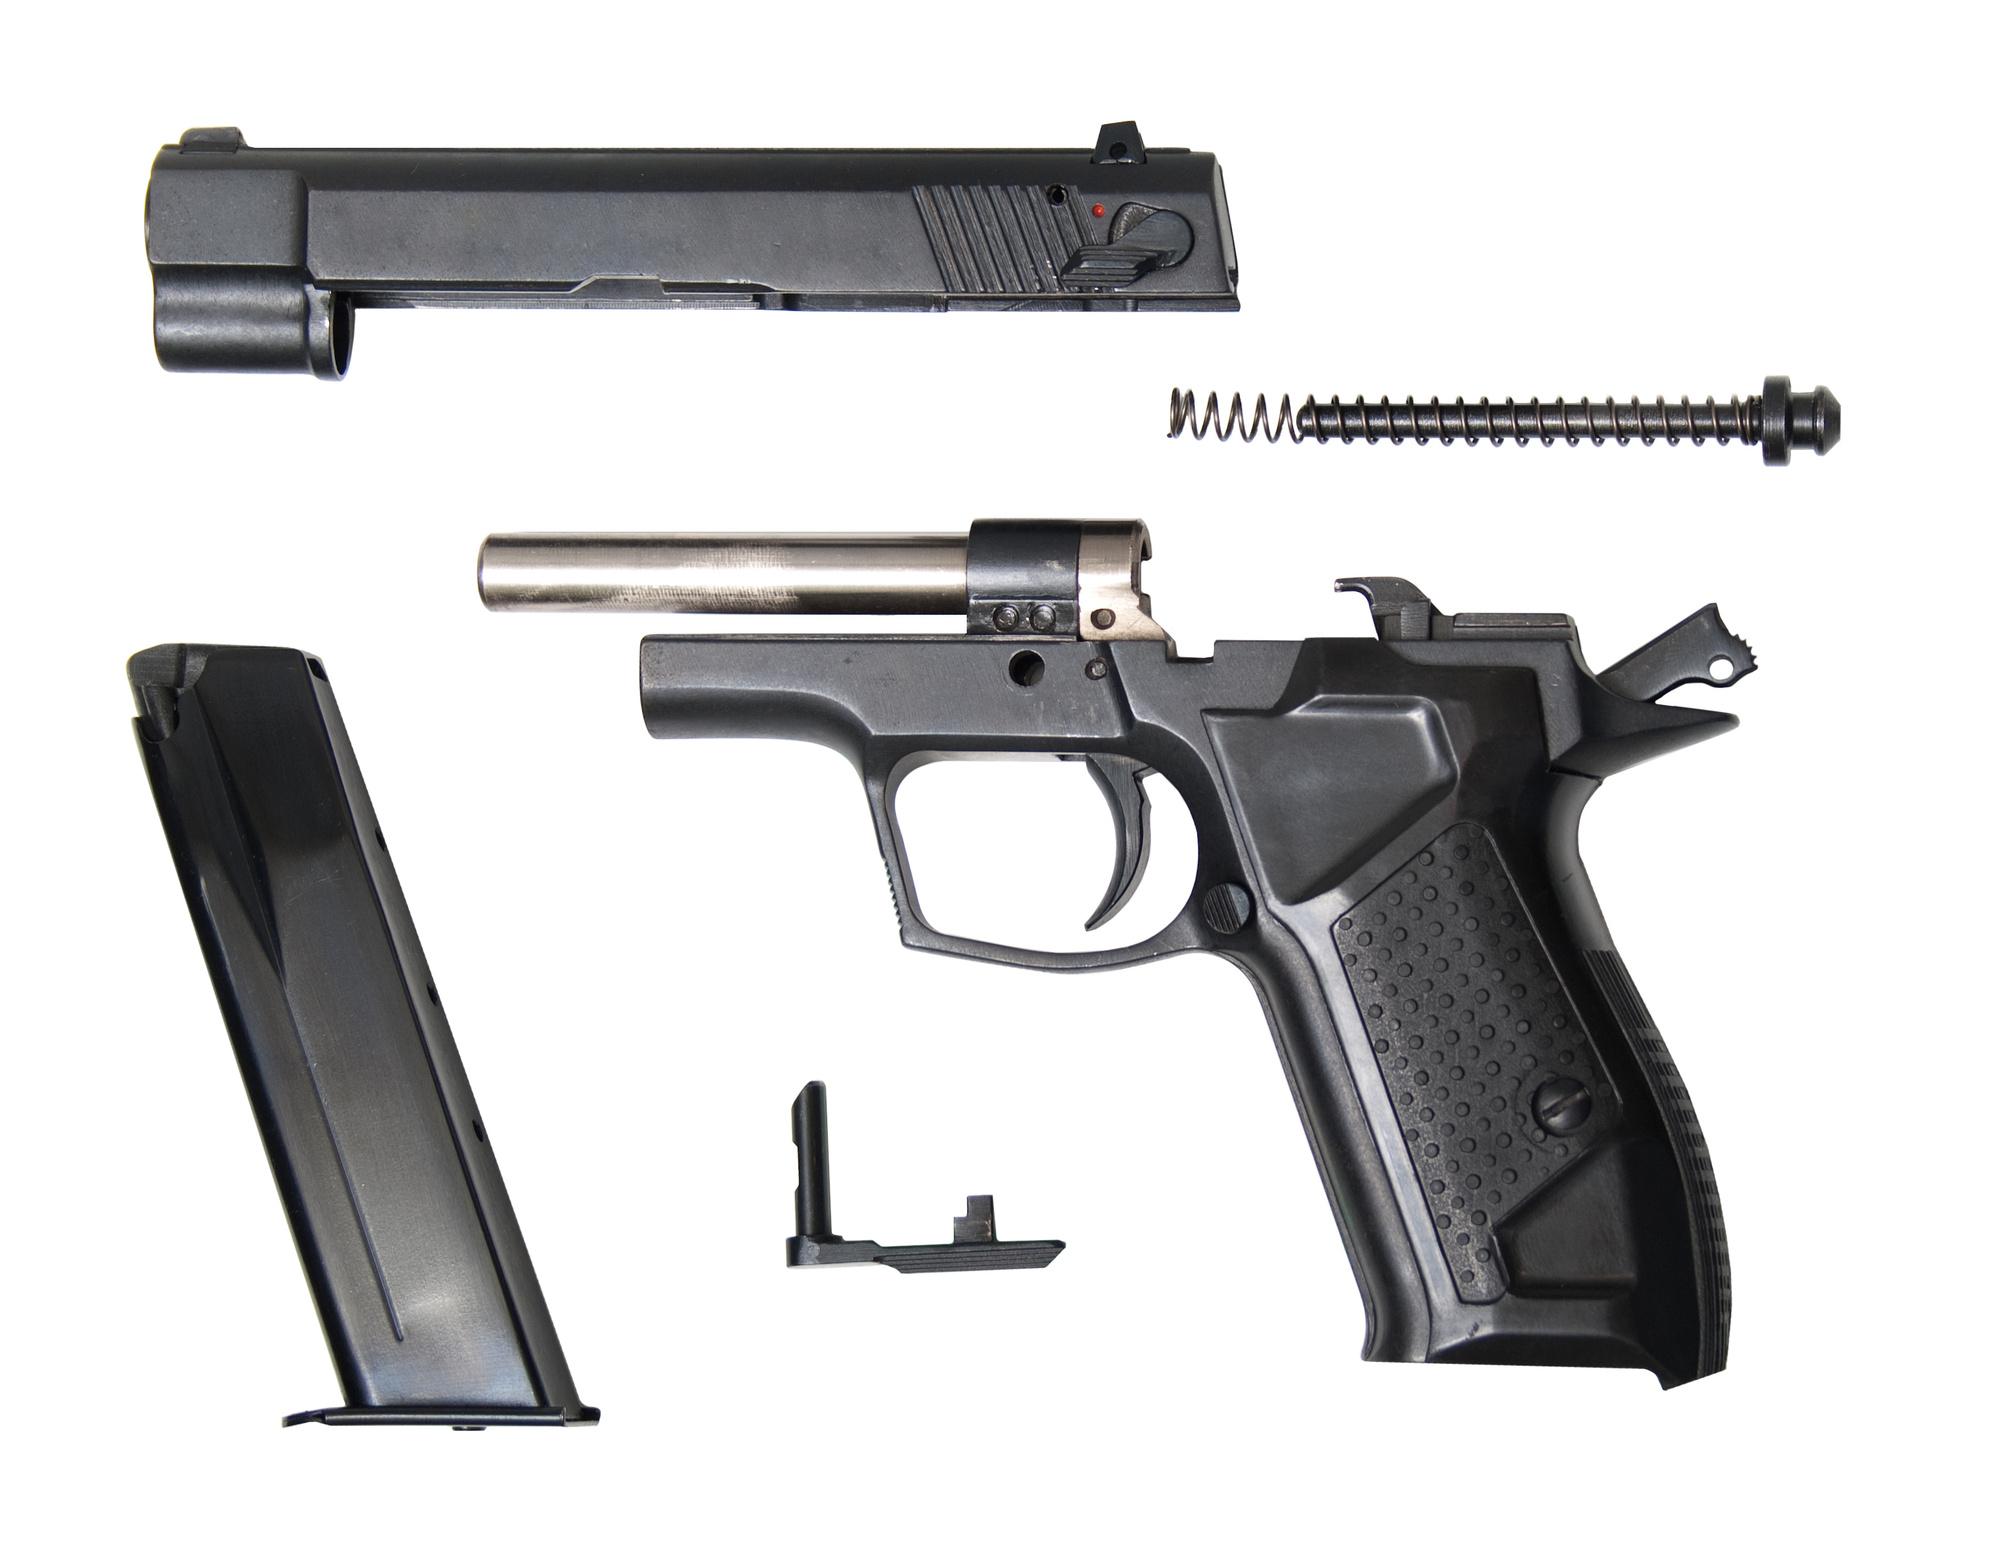 Parts of a Handgun